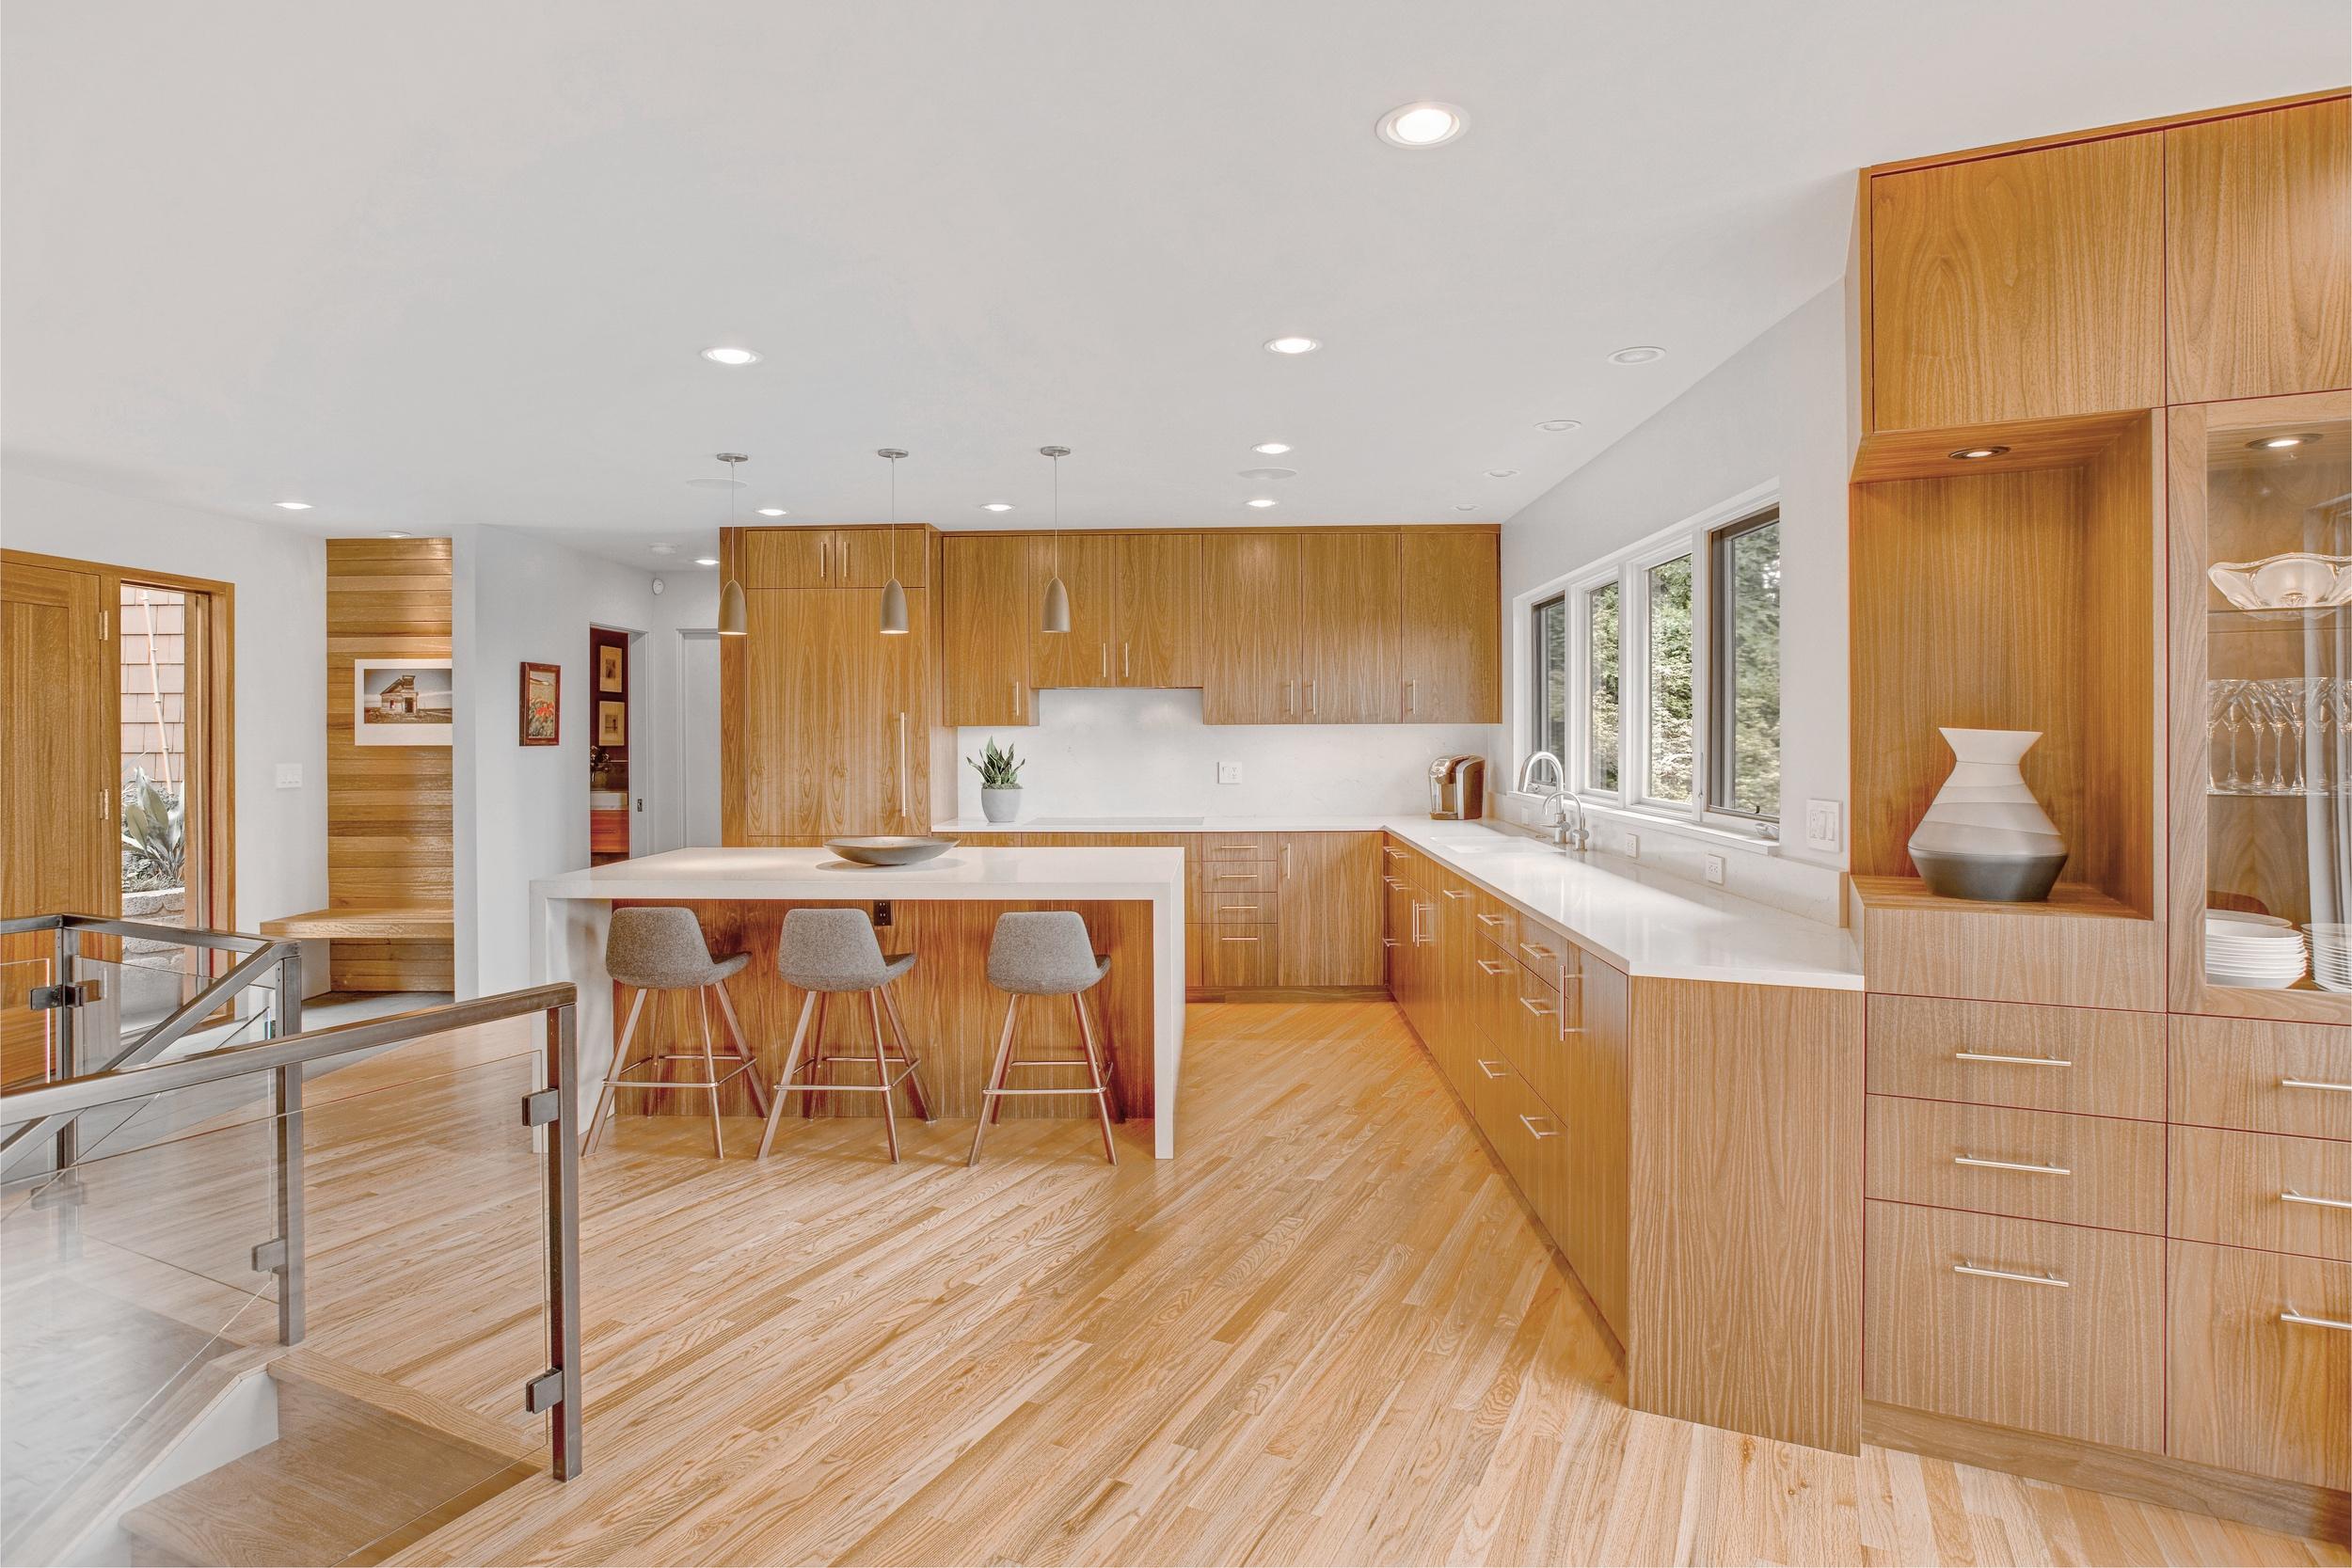 Kitchen_No Vent 02.jpg